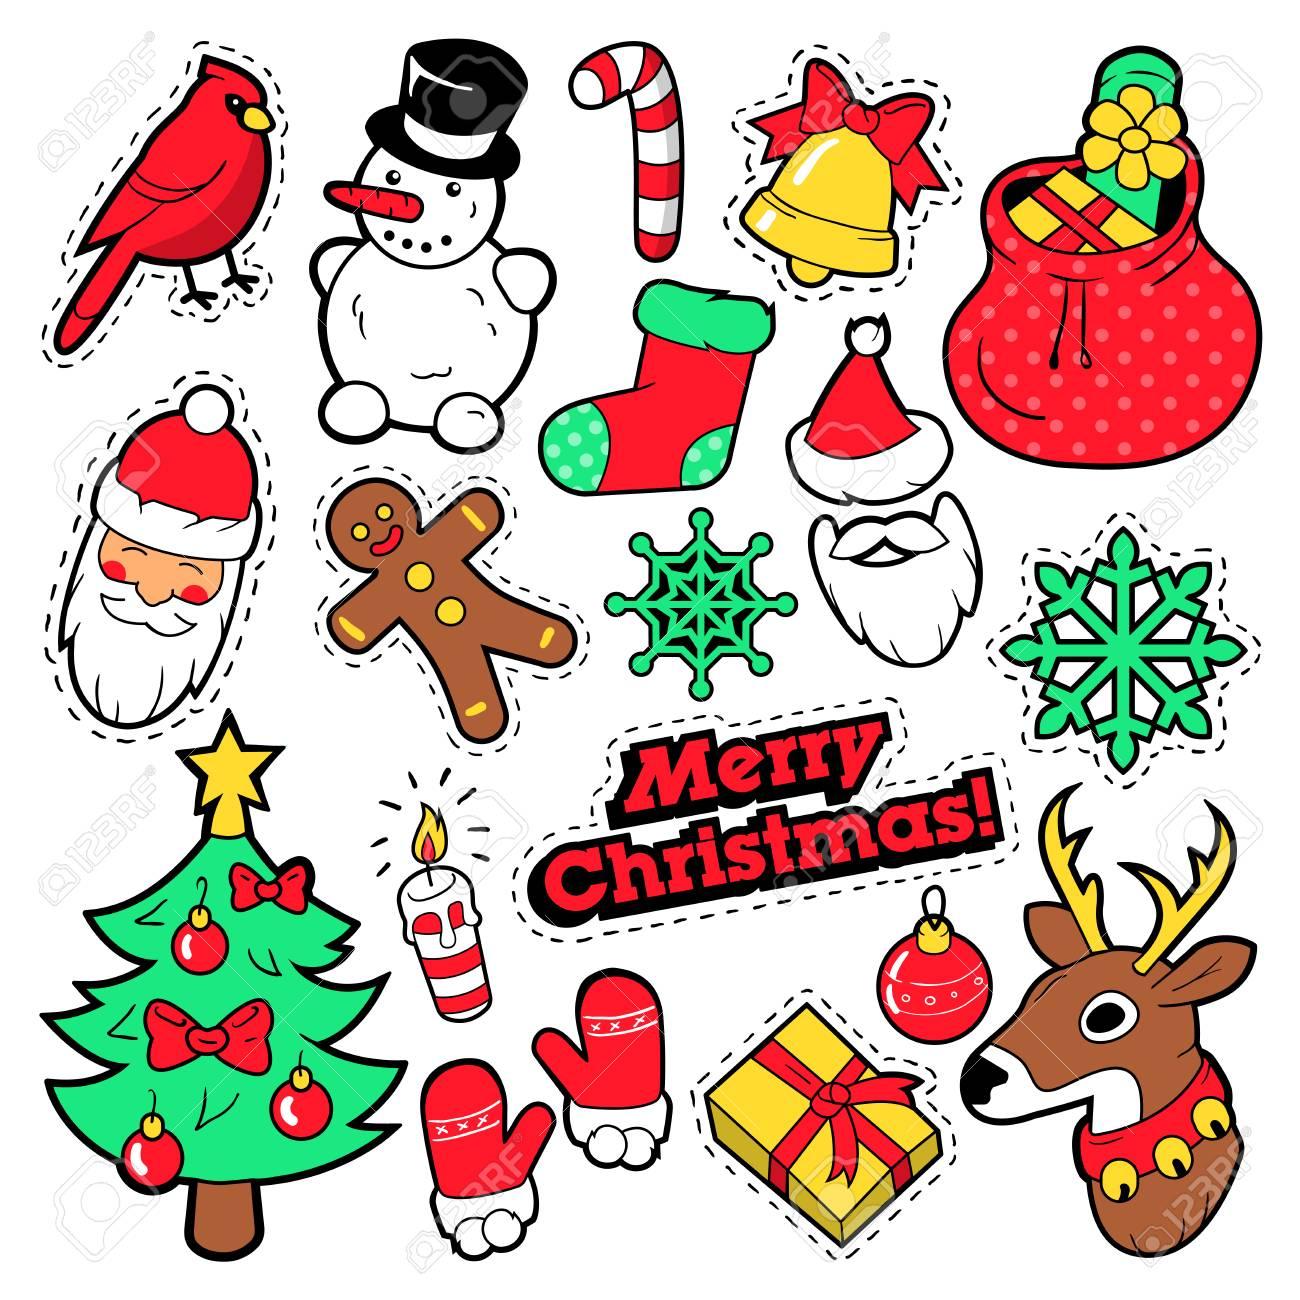 Comic Frohe Weihnachten.Stock Photo